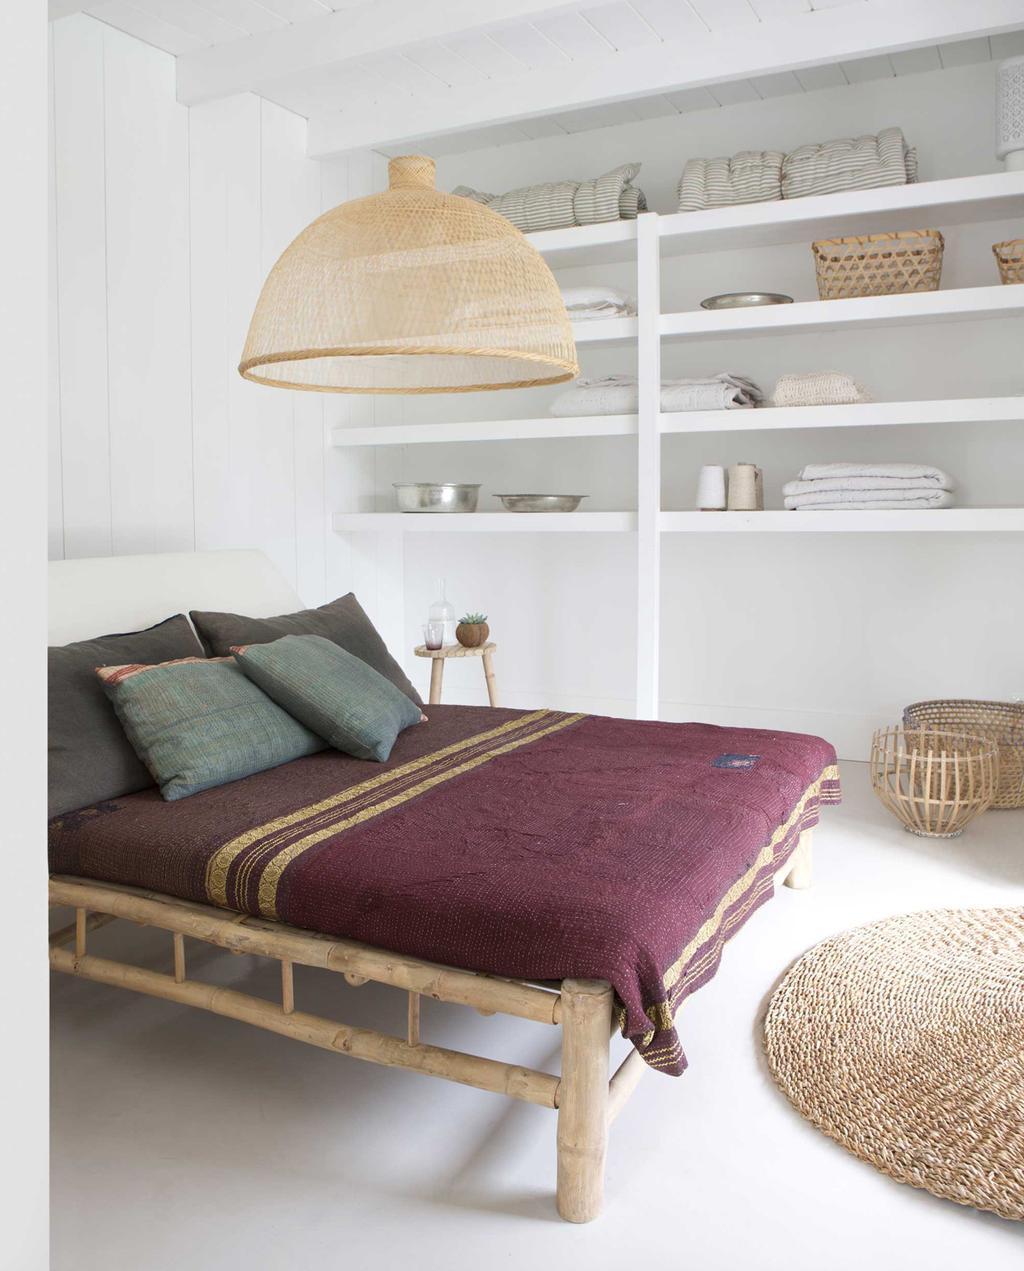 slaapkamer met bamboe bed